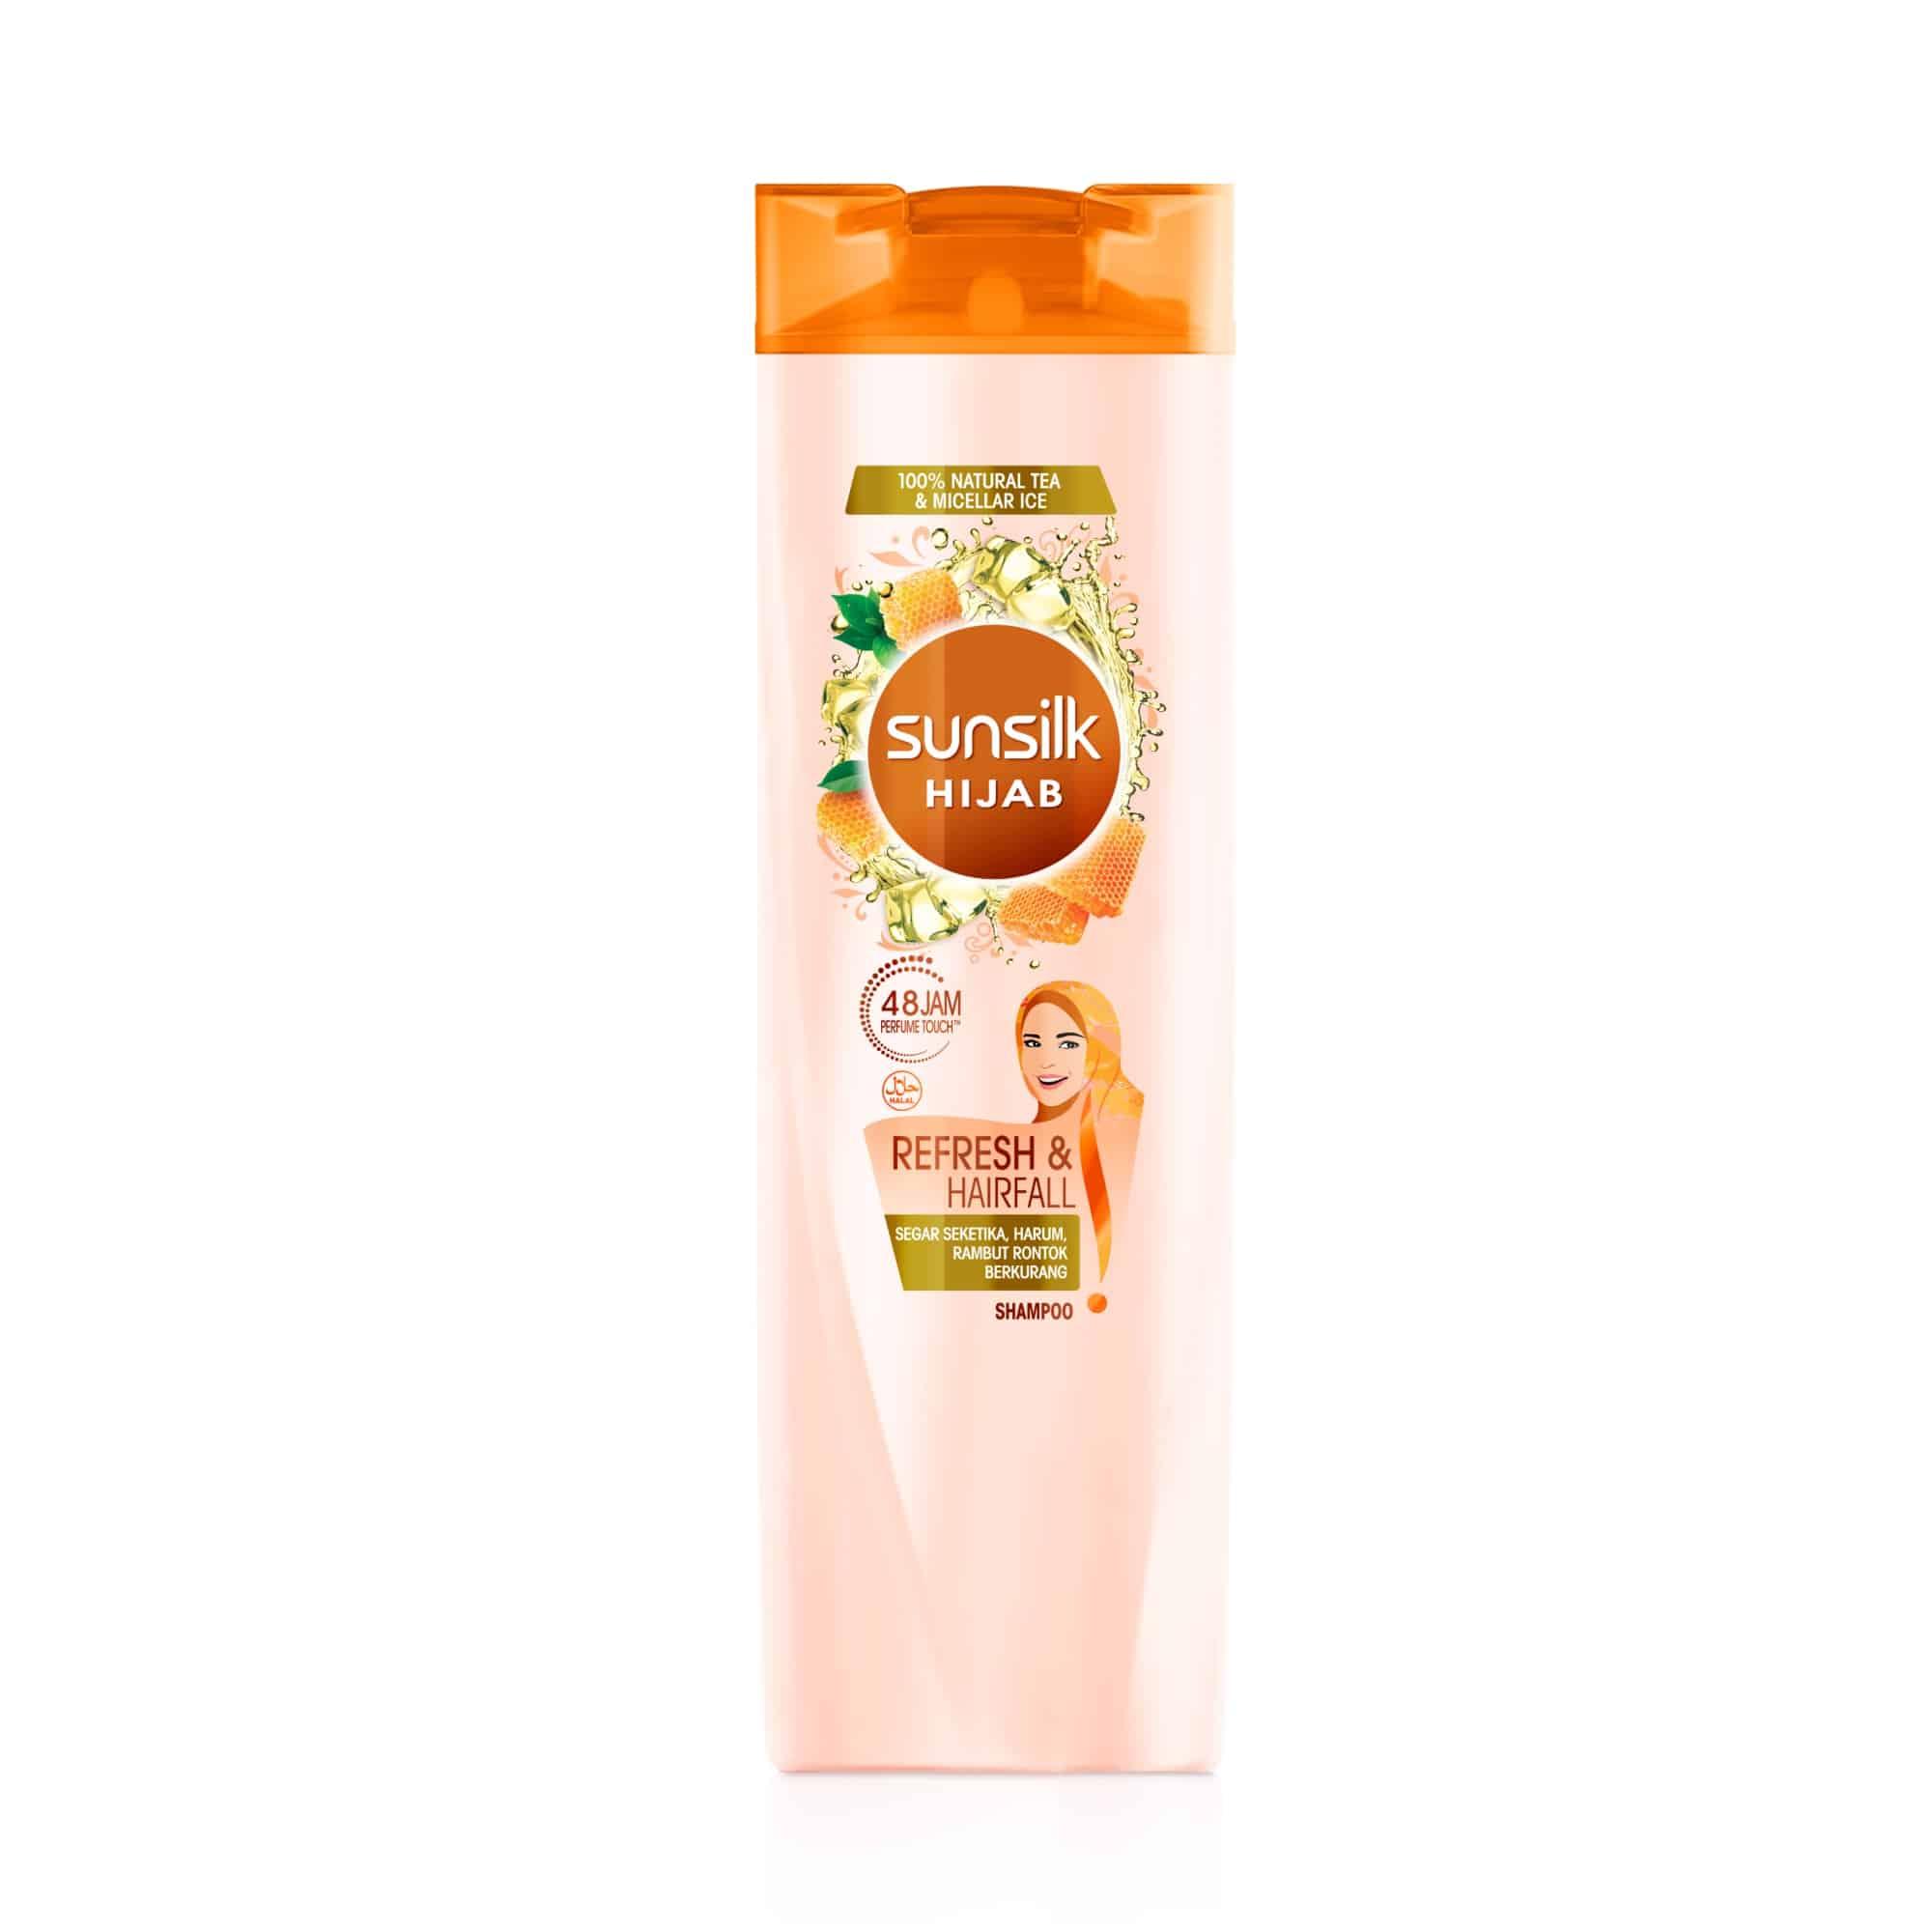 Sunsilk-Hijab-Recharge-Hairfall-Solution-Shampo